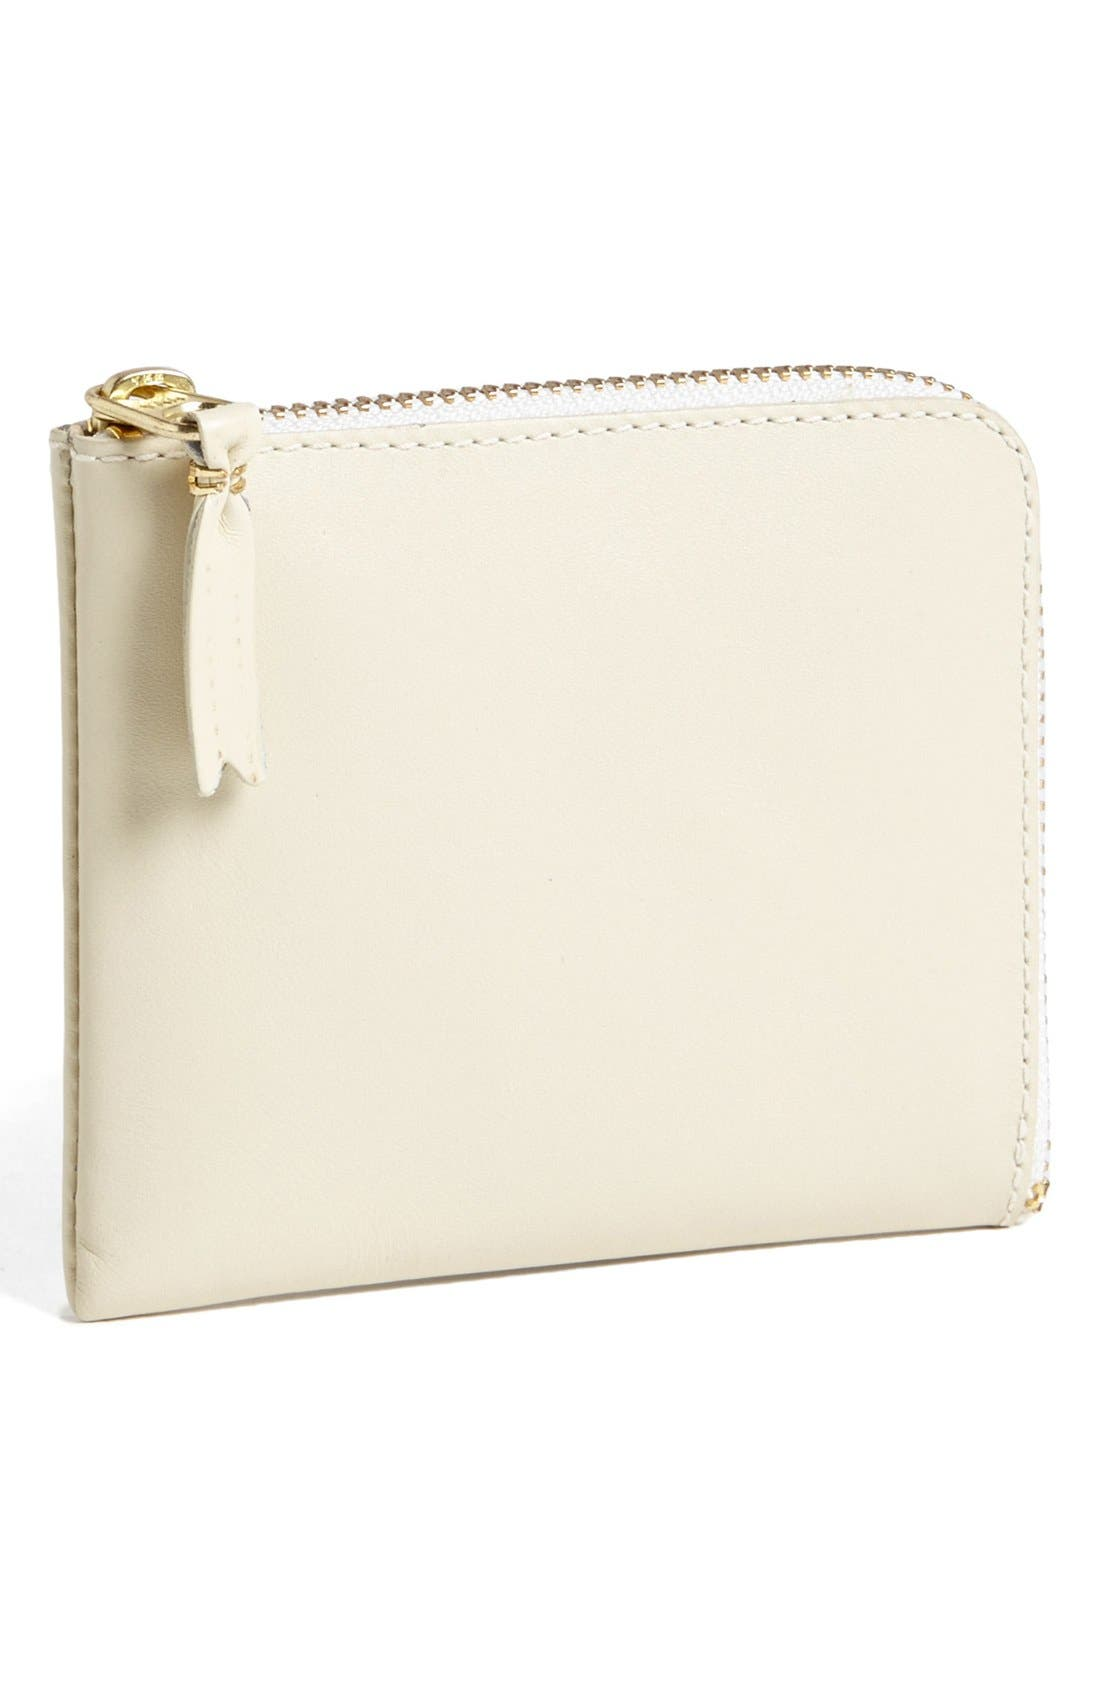 ,                             Half-Zip Leather Wallet,                             Main thumbnail 1, color,                             110